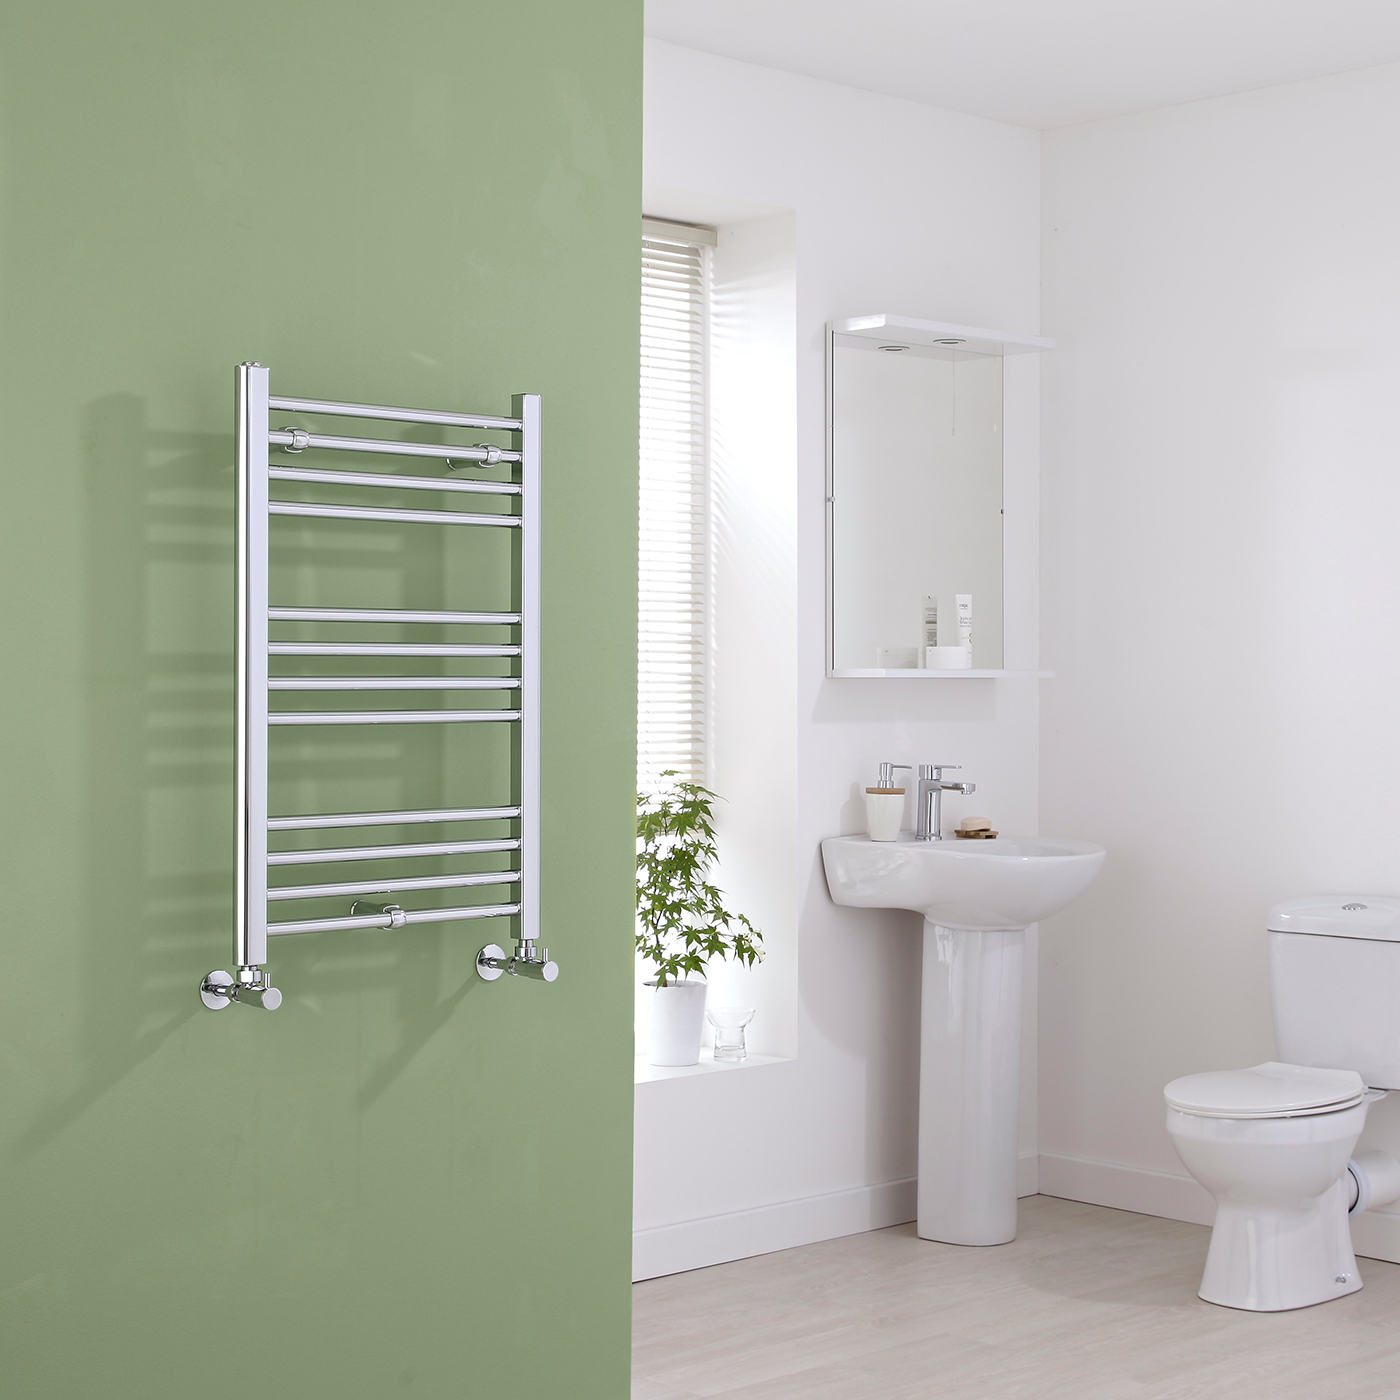 Milano Eco - Flat Chrome Heated Towel Rail 800mm x 500mm